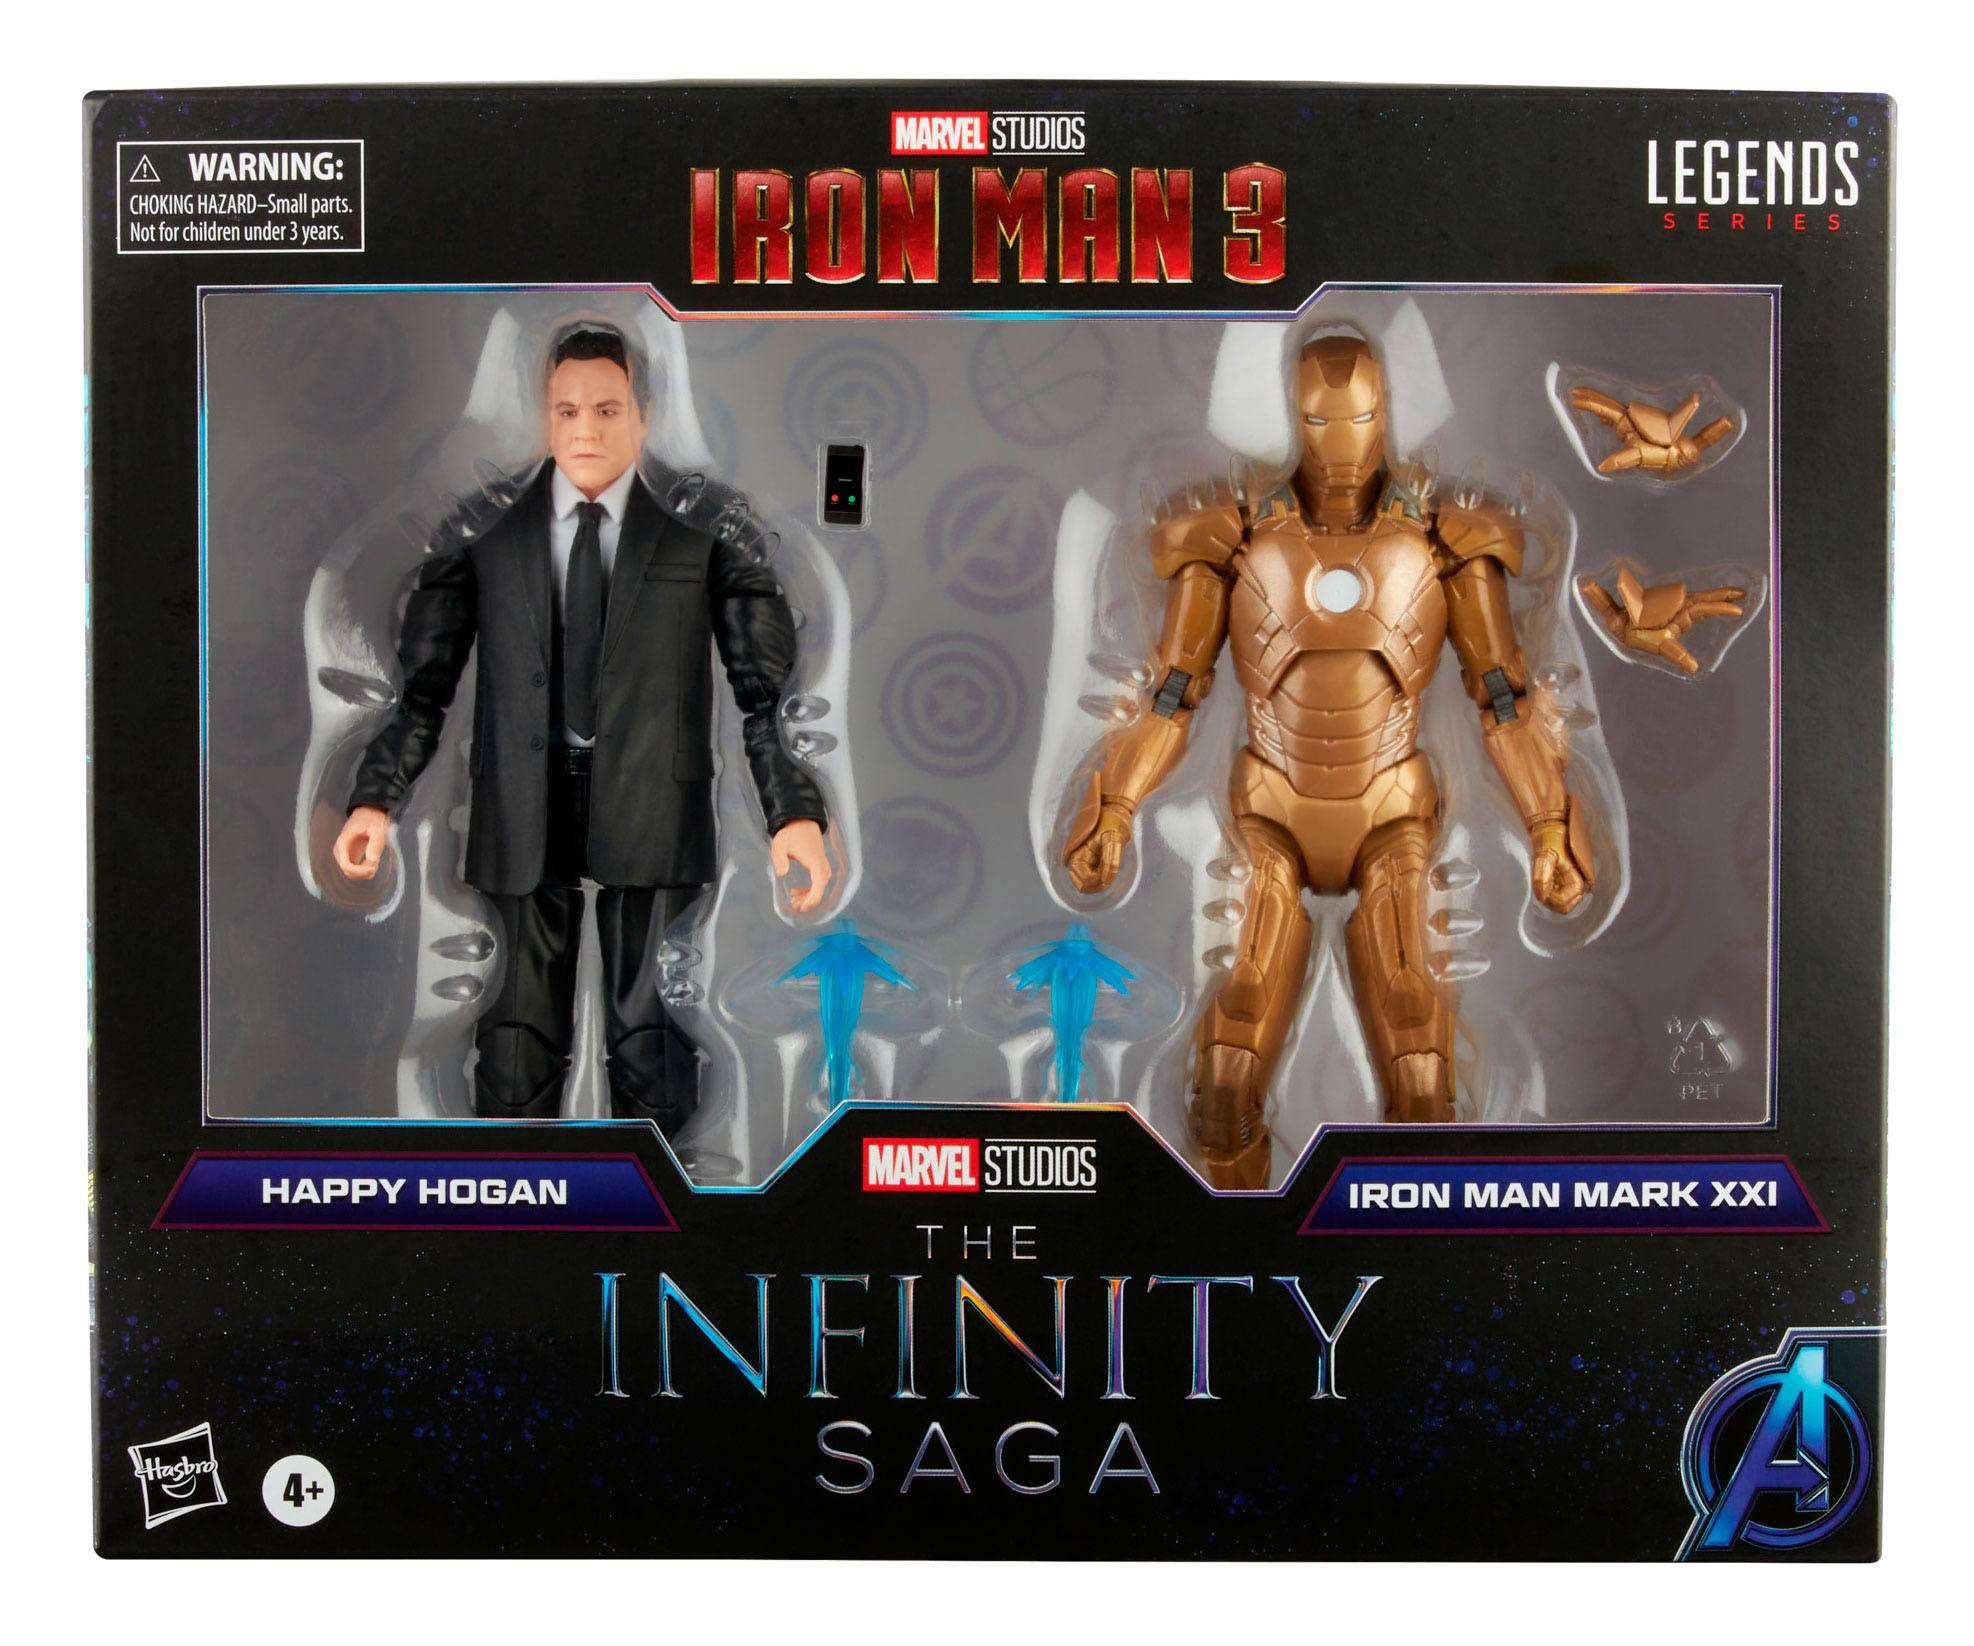 The Infinity Saga Marvel Legends Actionfiguren 2-Pack 2021 Happy Hogan & Iron Man (Iron Man 3) 15 cm F01915L00 5010993839674